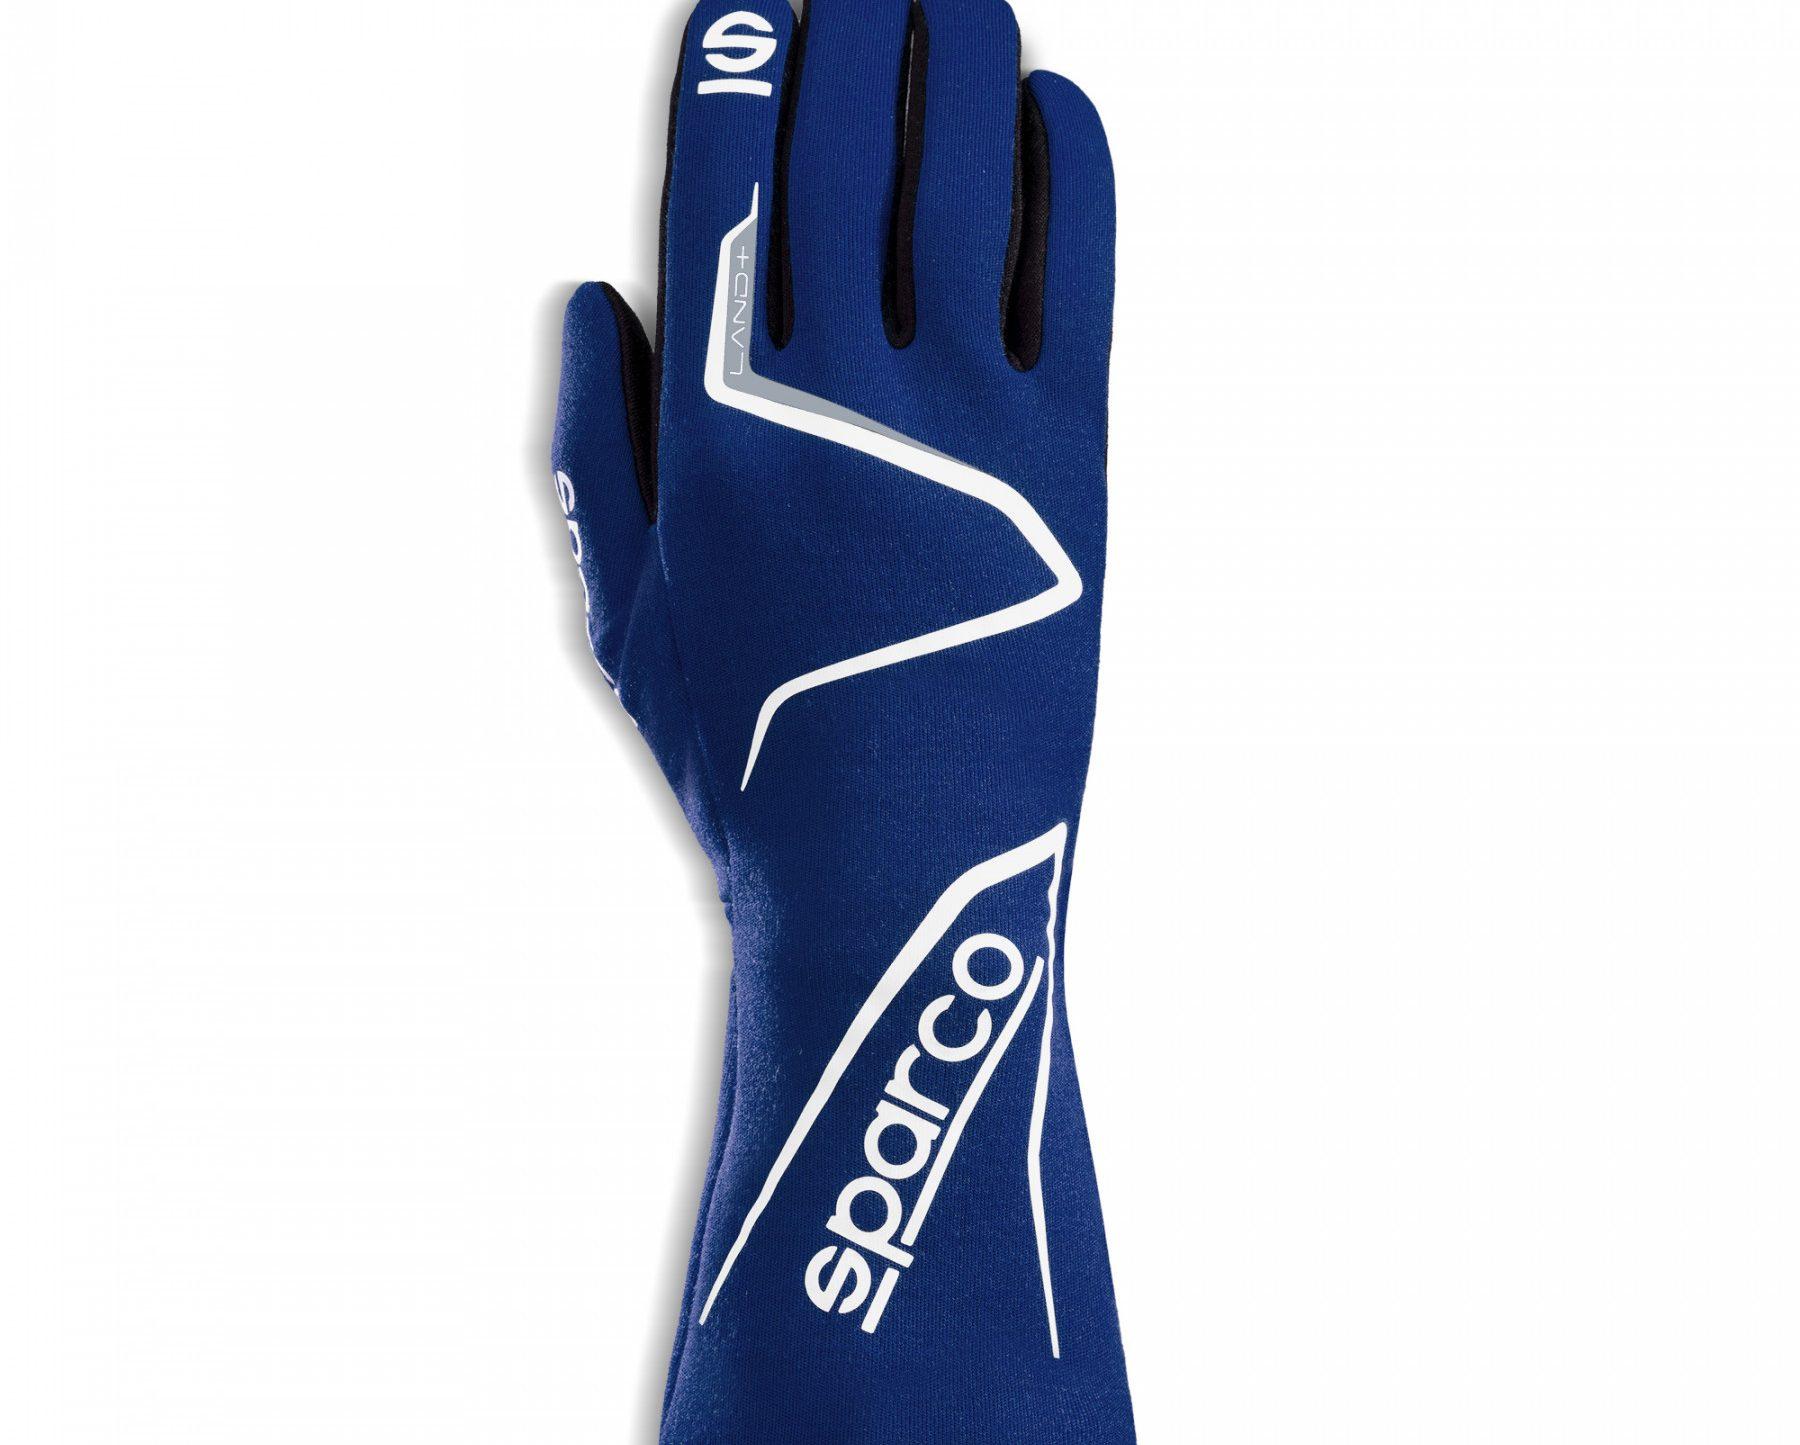 Нов продукт: Sparco Land +, FIA Gloves